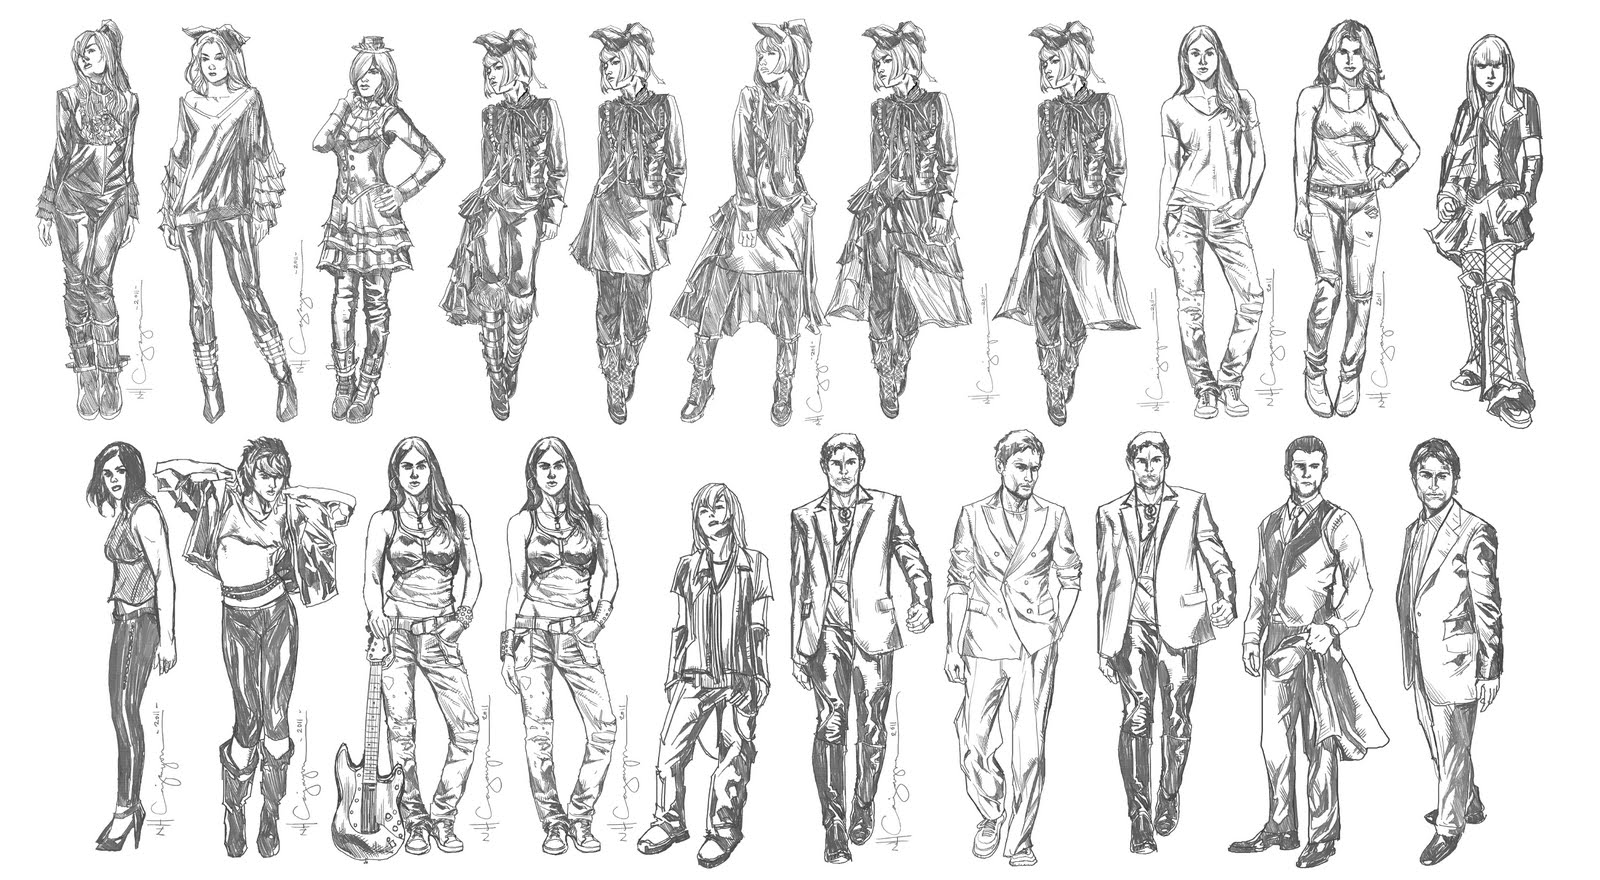 Character Design Art : Nhc art fantasy character design